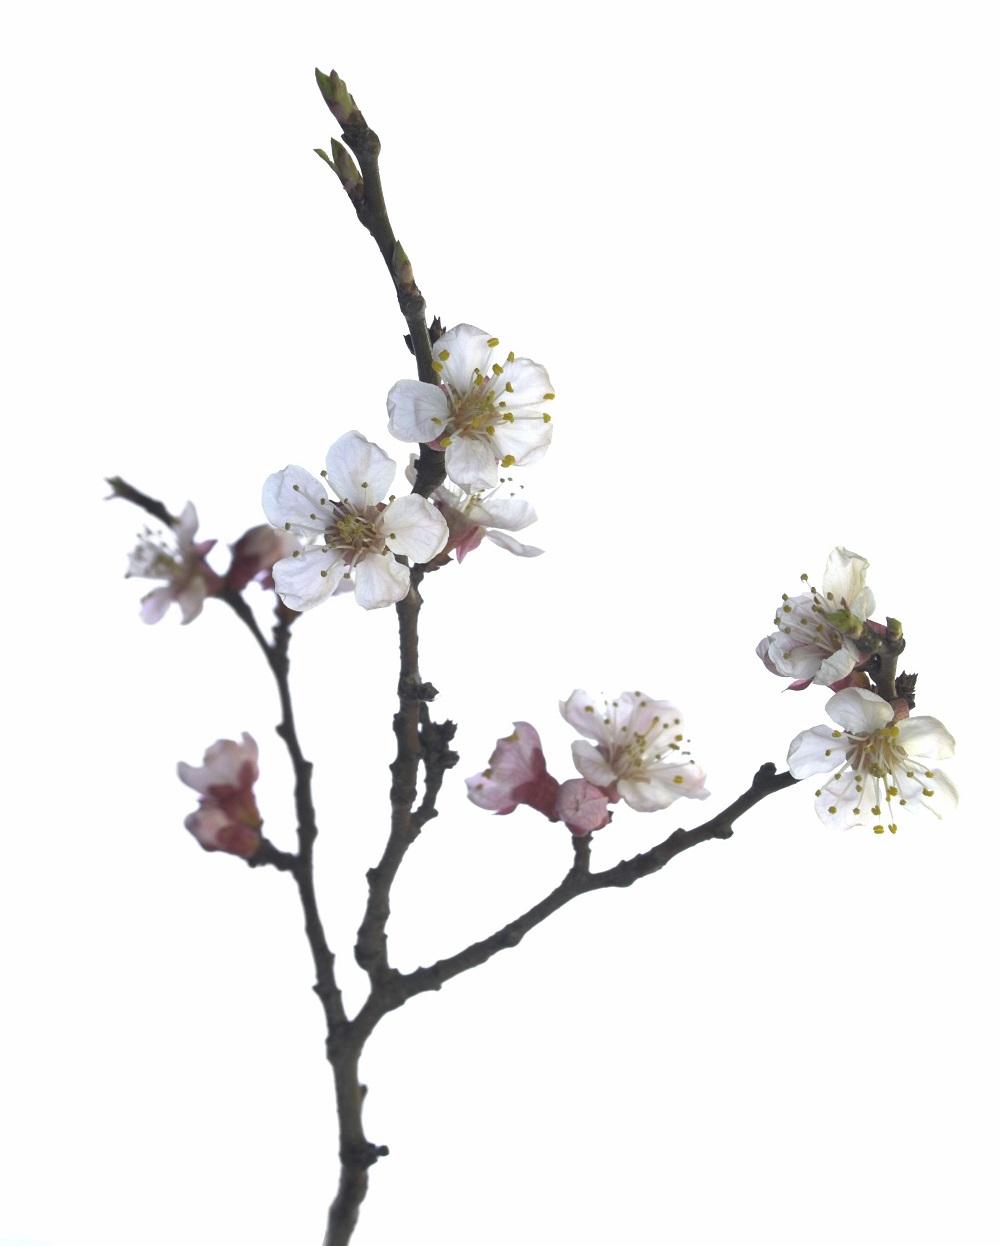 Marillenblüte - Garten-CH - NaturLust #15 - NaturGarten S. 22-27